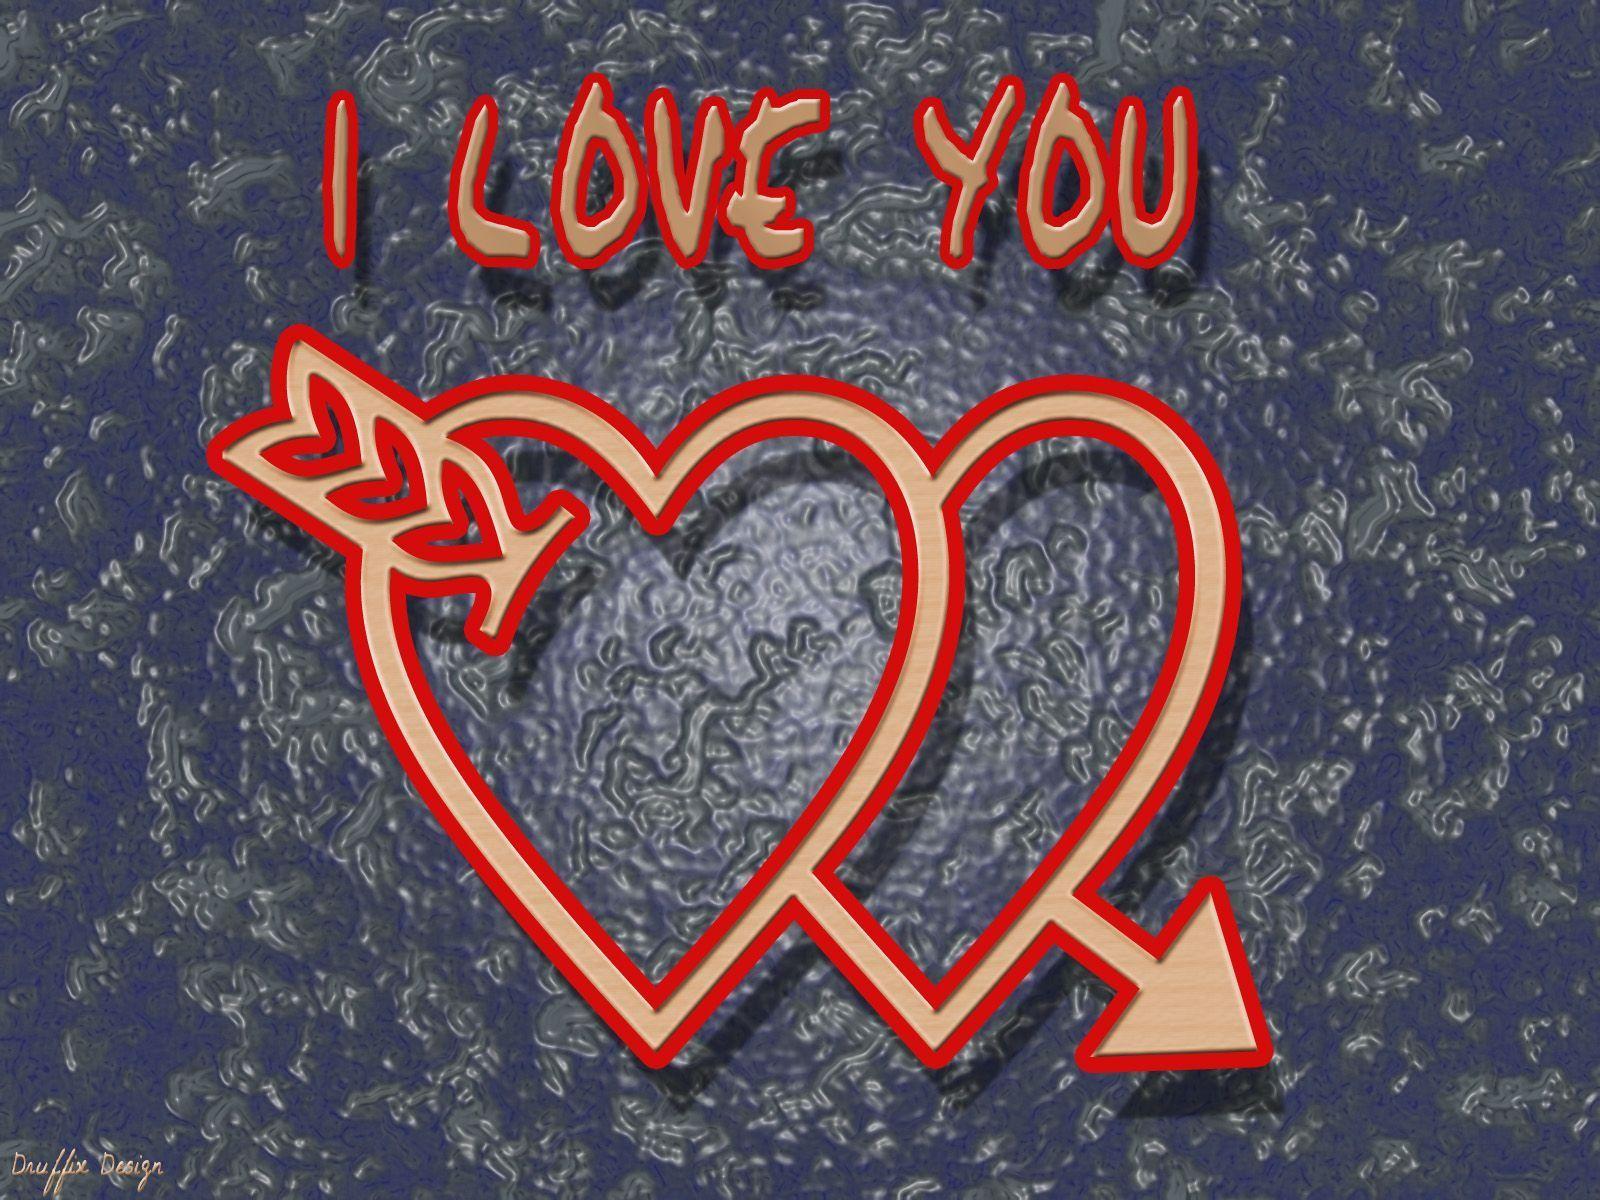 http://1.bp.blogspot.com/-1naNdNTEHxY/UO24xcSG1aI/AAAAAAAABmg/tf0cbEQyReQ/s1600/i+love+you+2+(14).jpg